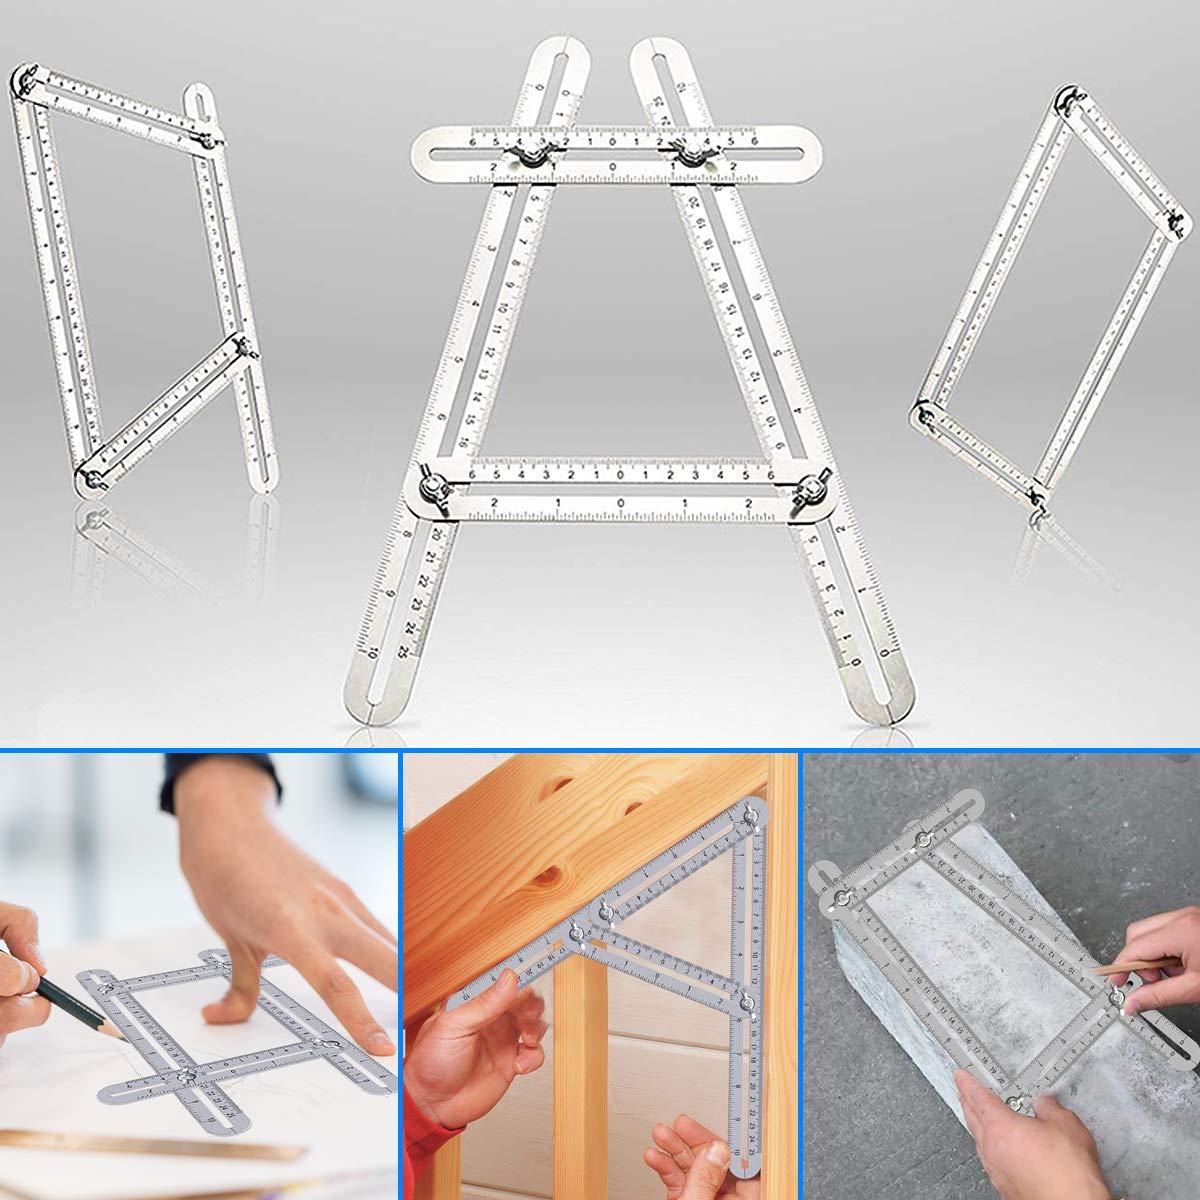 Builders Multi Angle Ruler Template Tool Ruler DIY Craftsmen Omont Stainless Steel Angle Finder Measurement Ruler for Handymen